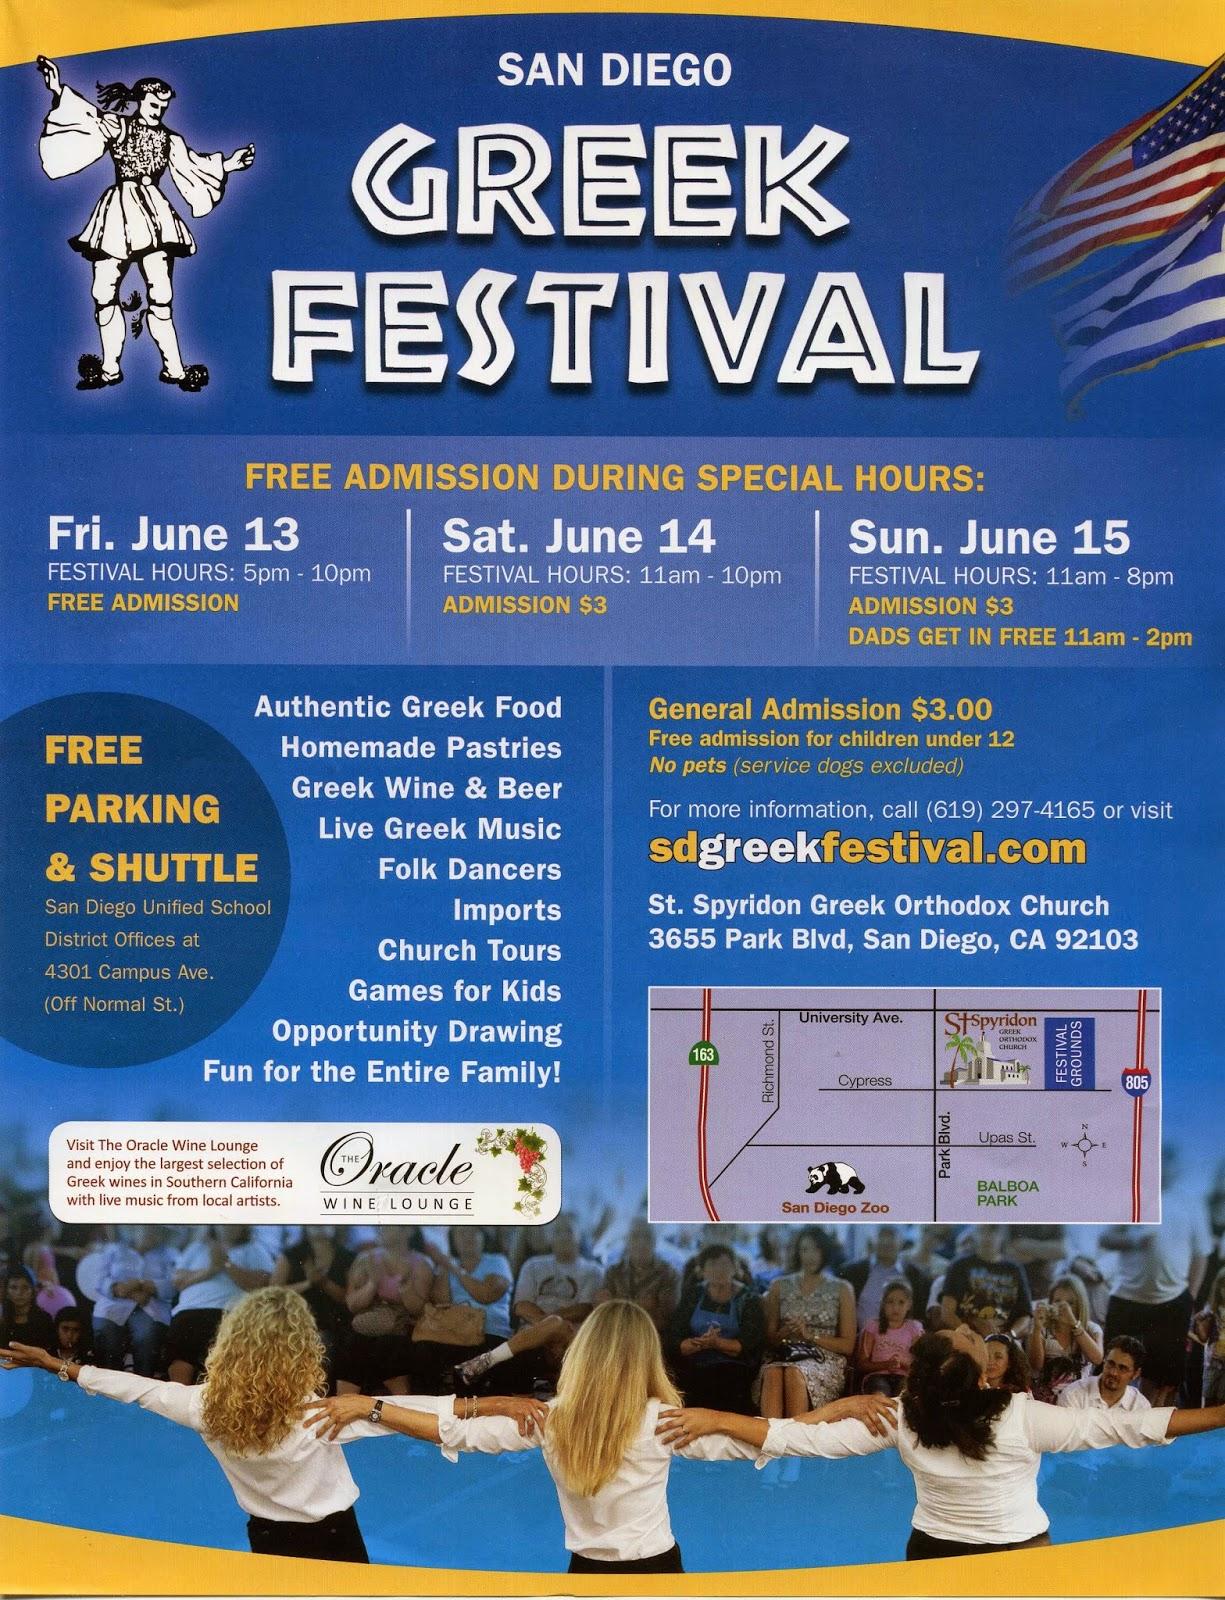 http://sdgreekfestival.com/SD_GREEK_FEST_%5BHOME%5D.html